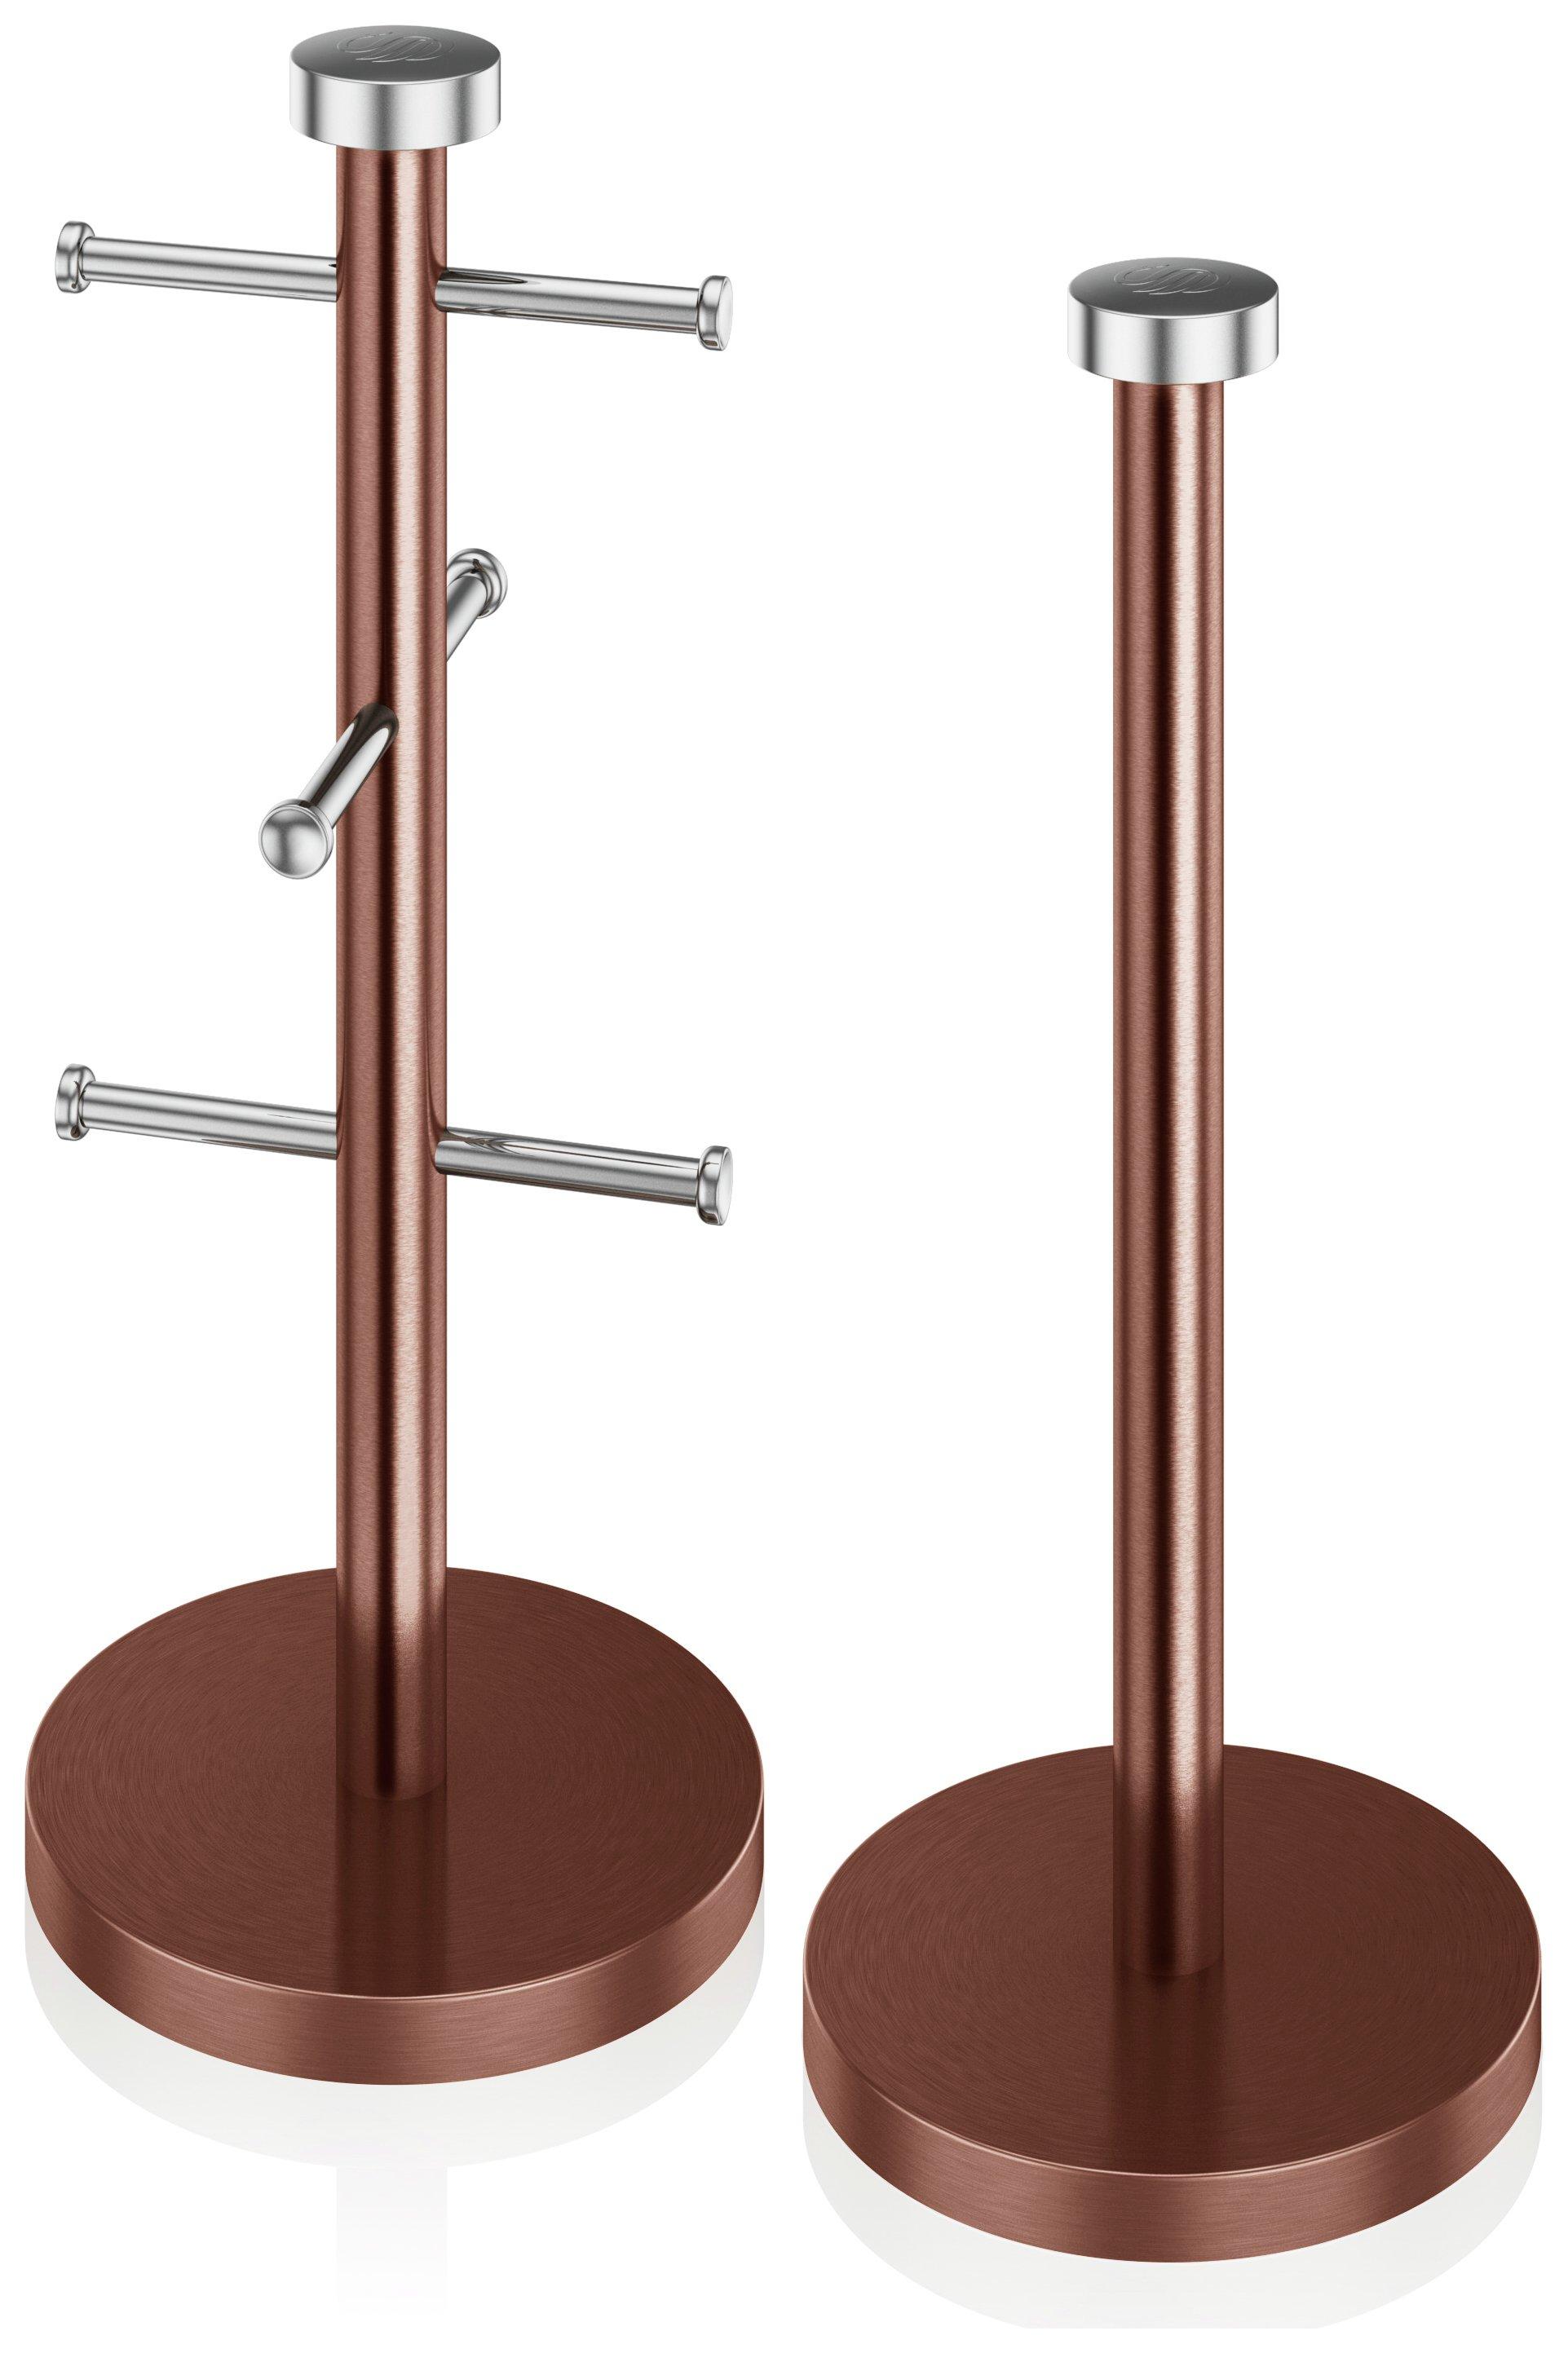 Swan - Towel Pole and Mug Tree - Copper